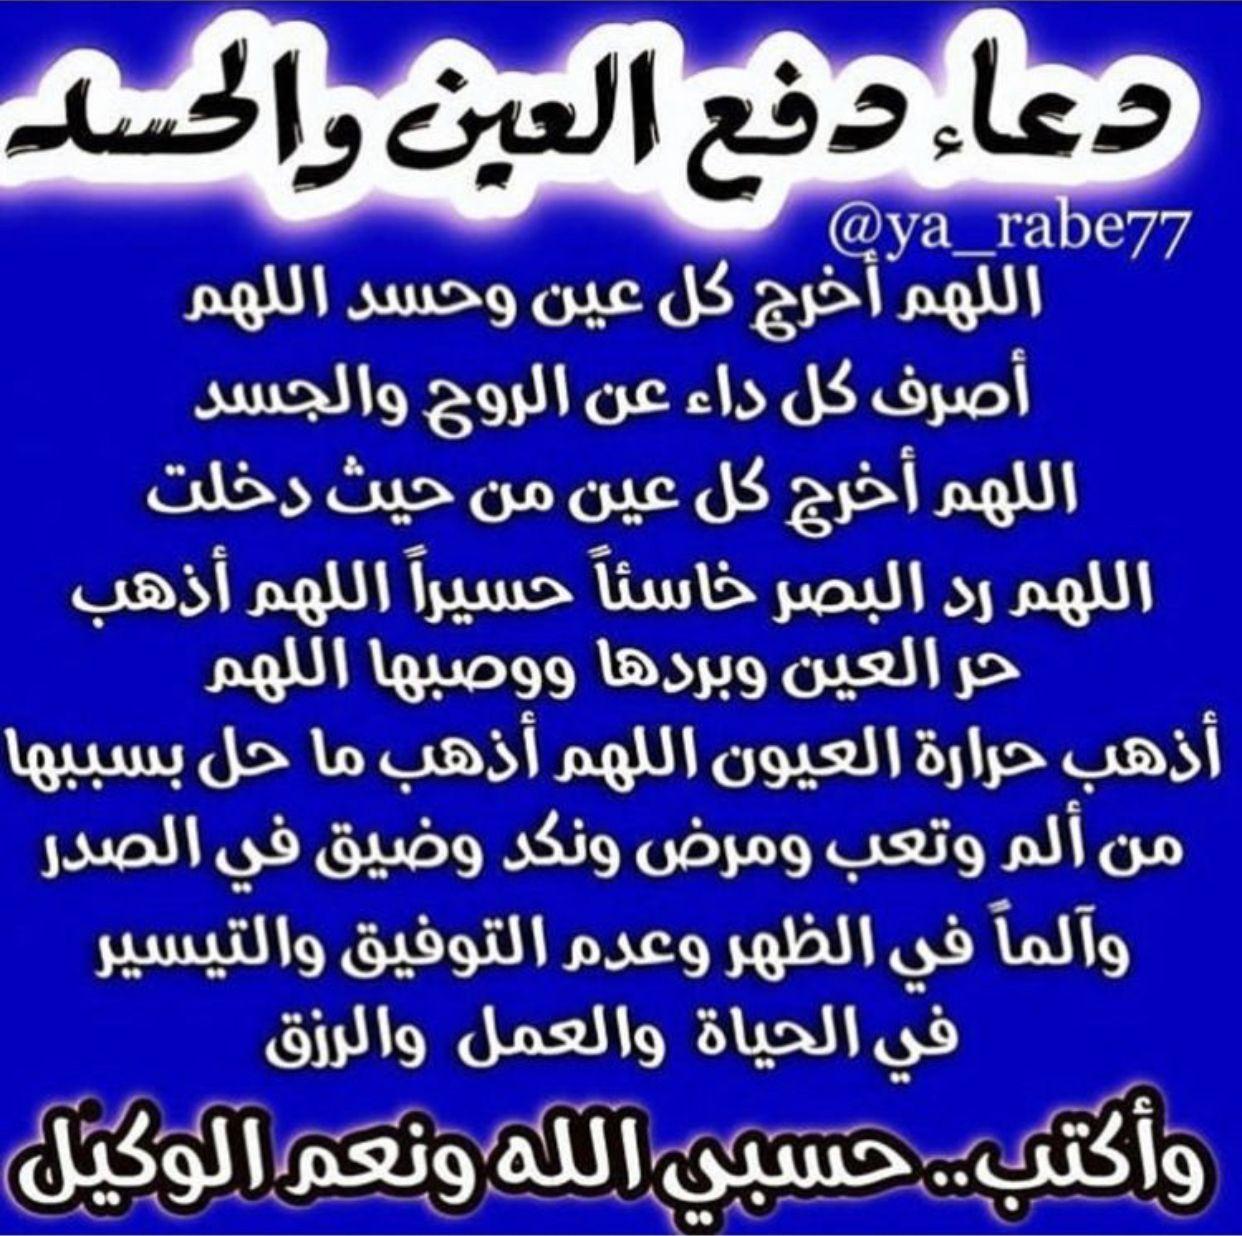 Pin By Om Ali Lolo Ali On اذكارات Islamic Phrases Islam Facts Islam Beliefs